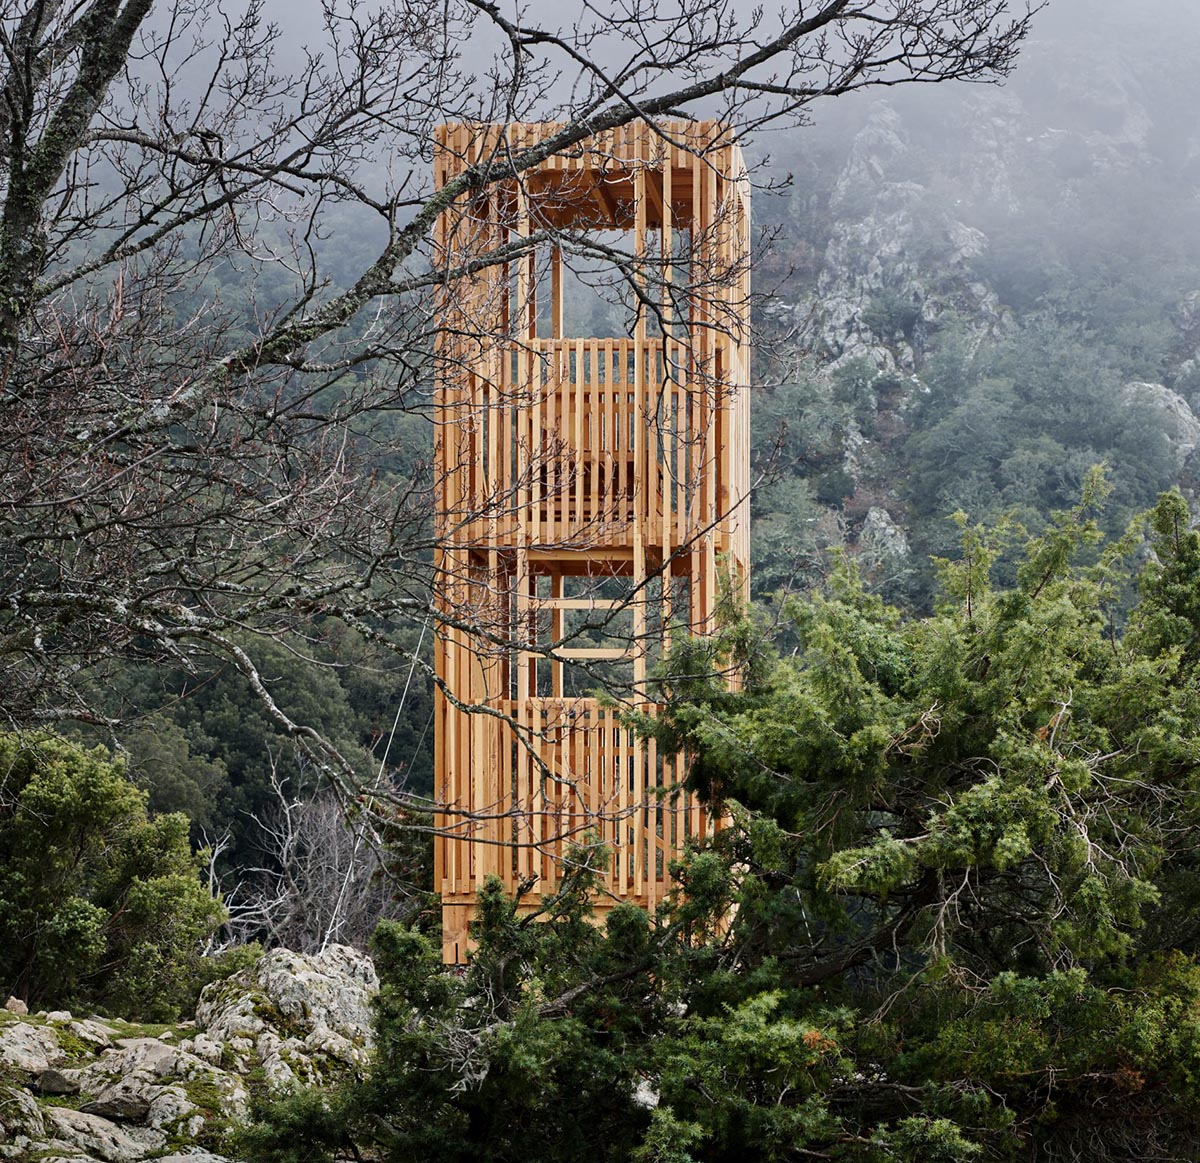 Observatoire-Cerf-Corse -orma-architettura-04